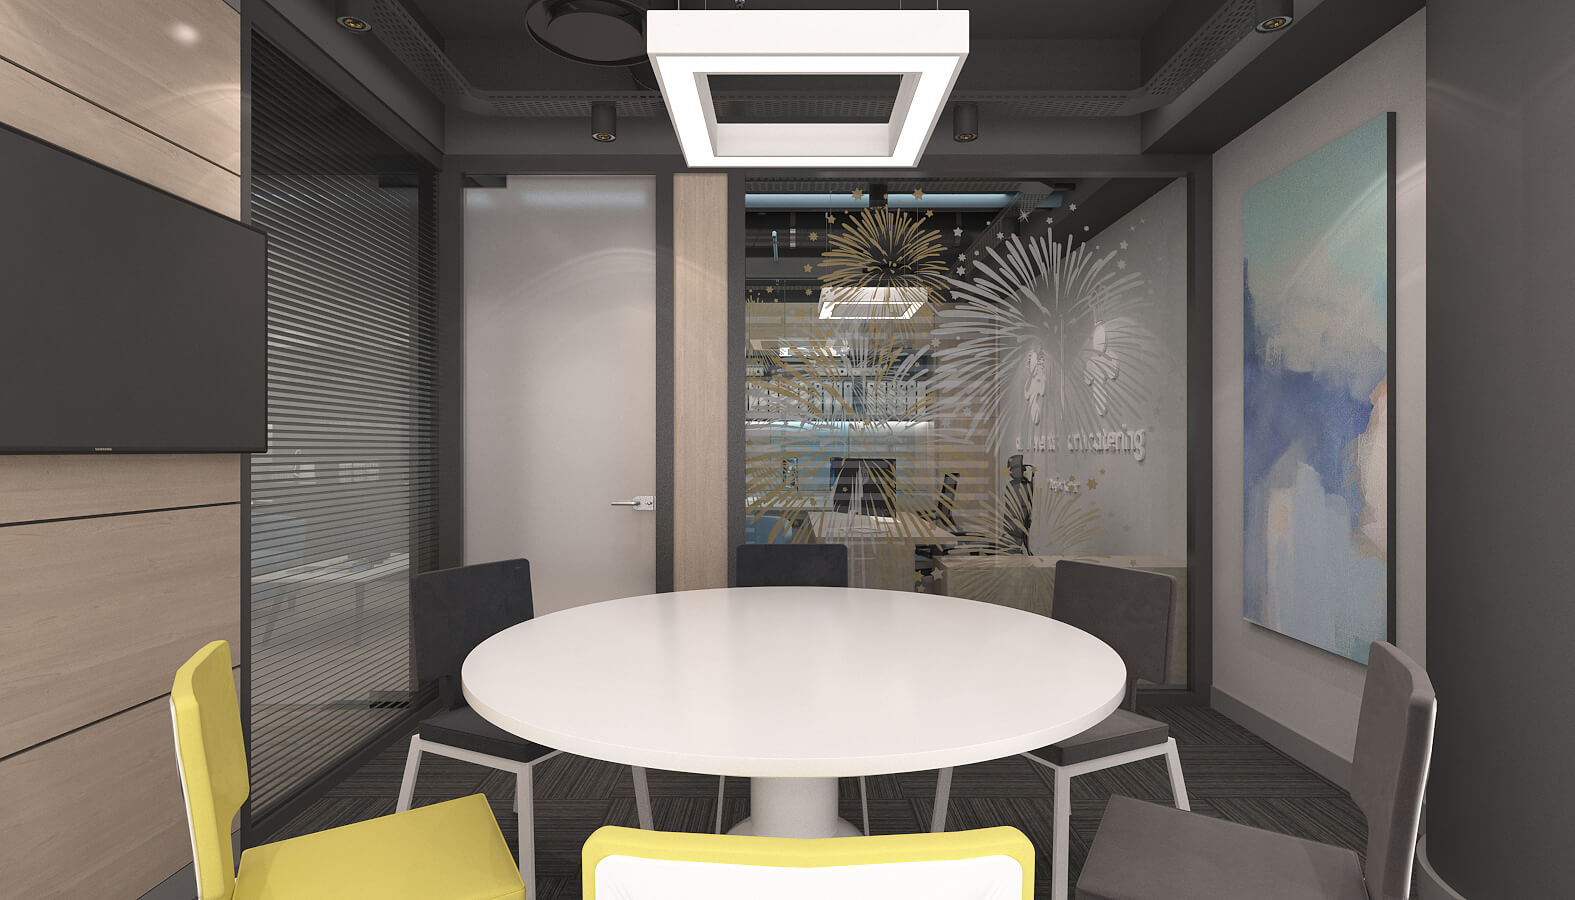 ofis dekorasyonu 3635 Artı Entegre Ofisler